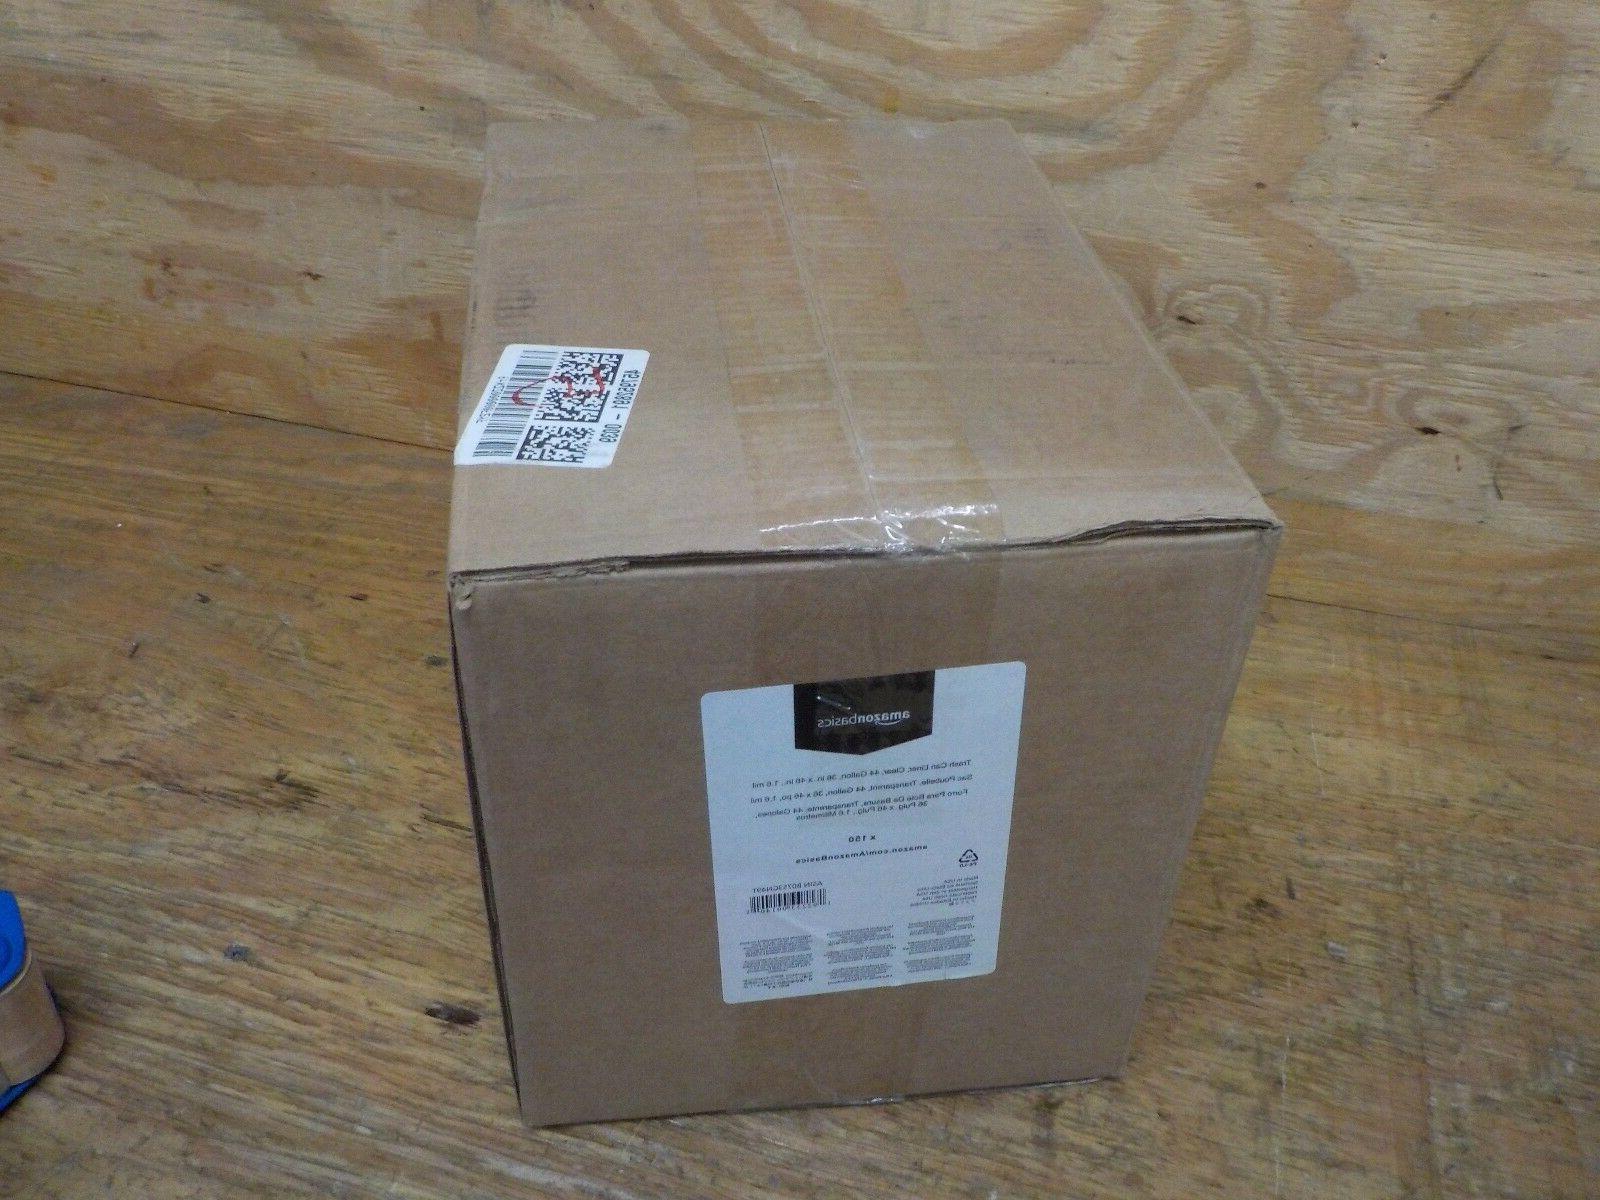 AmazonBasics Can 1.6 Black, 150-Count